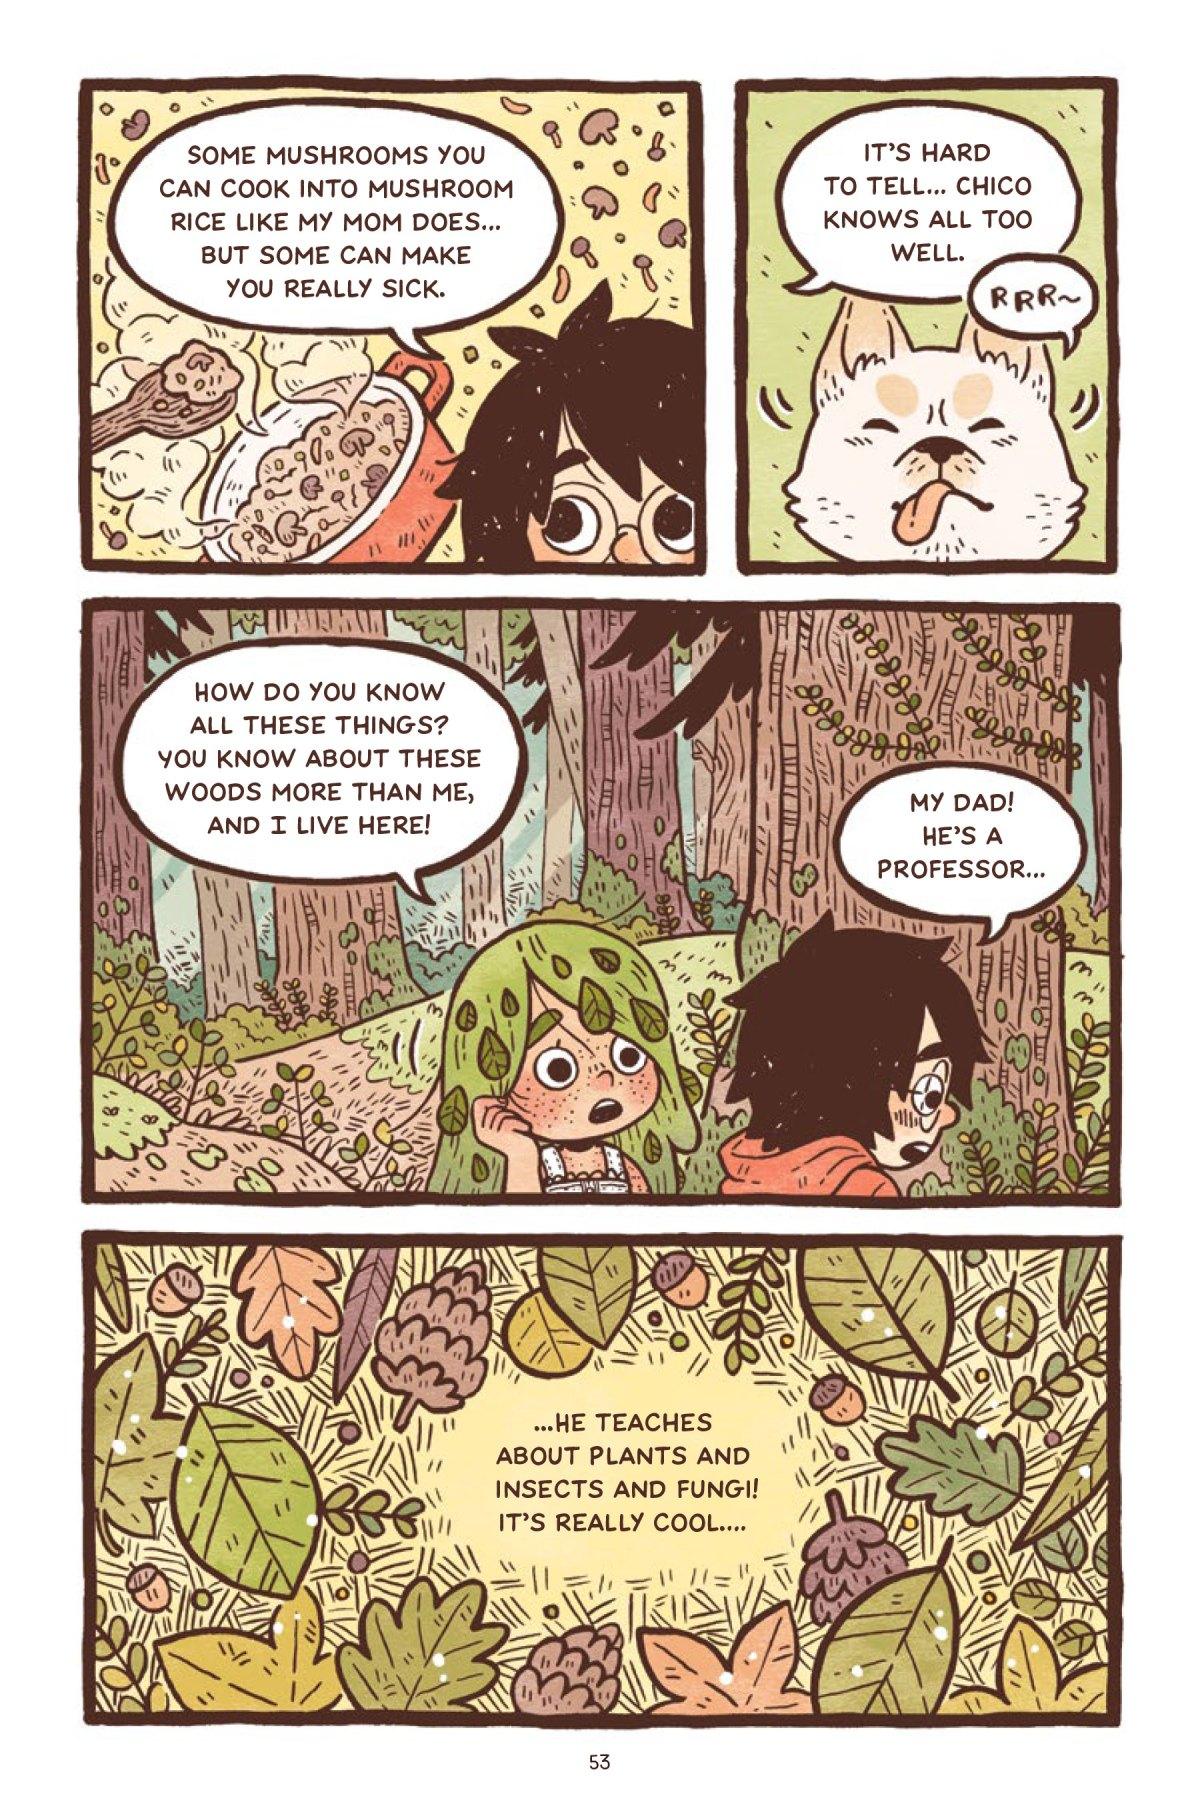 Mai K. Nguyen's Pilu of the Woods